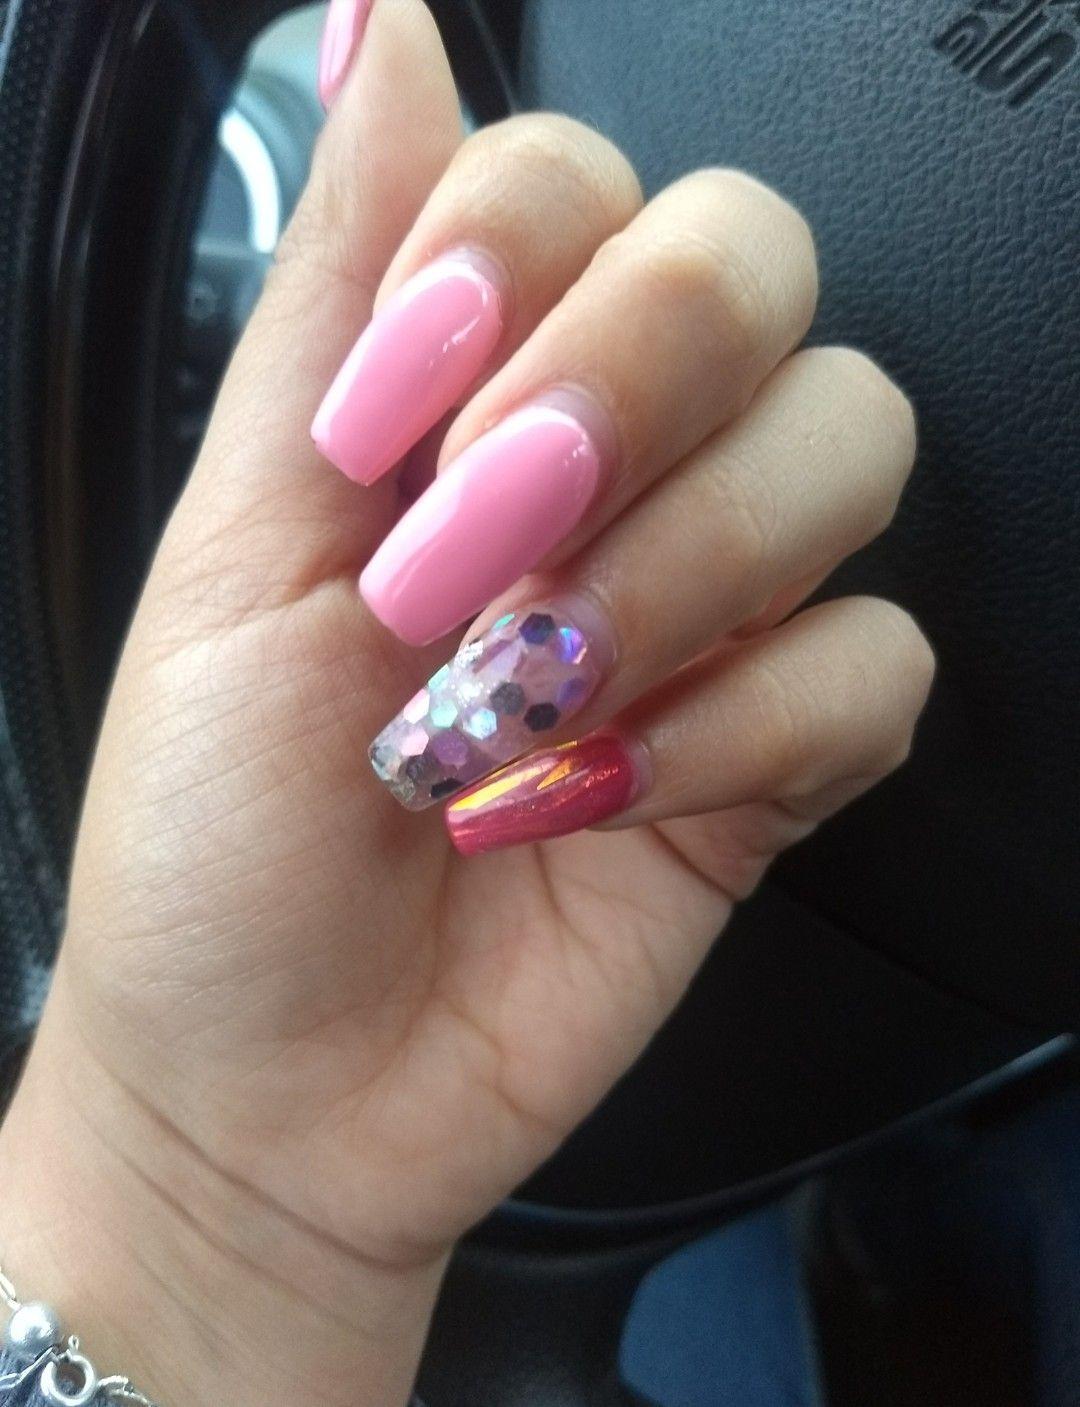 #rosa #pink #pinknails #uñas #nailsfactory #organic #Gel #acrilico